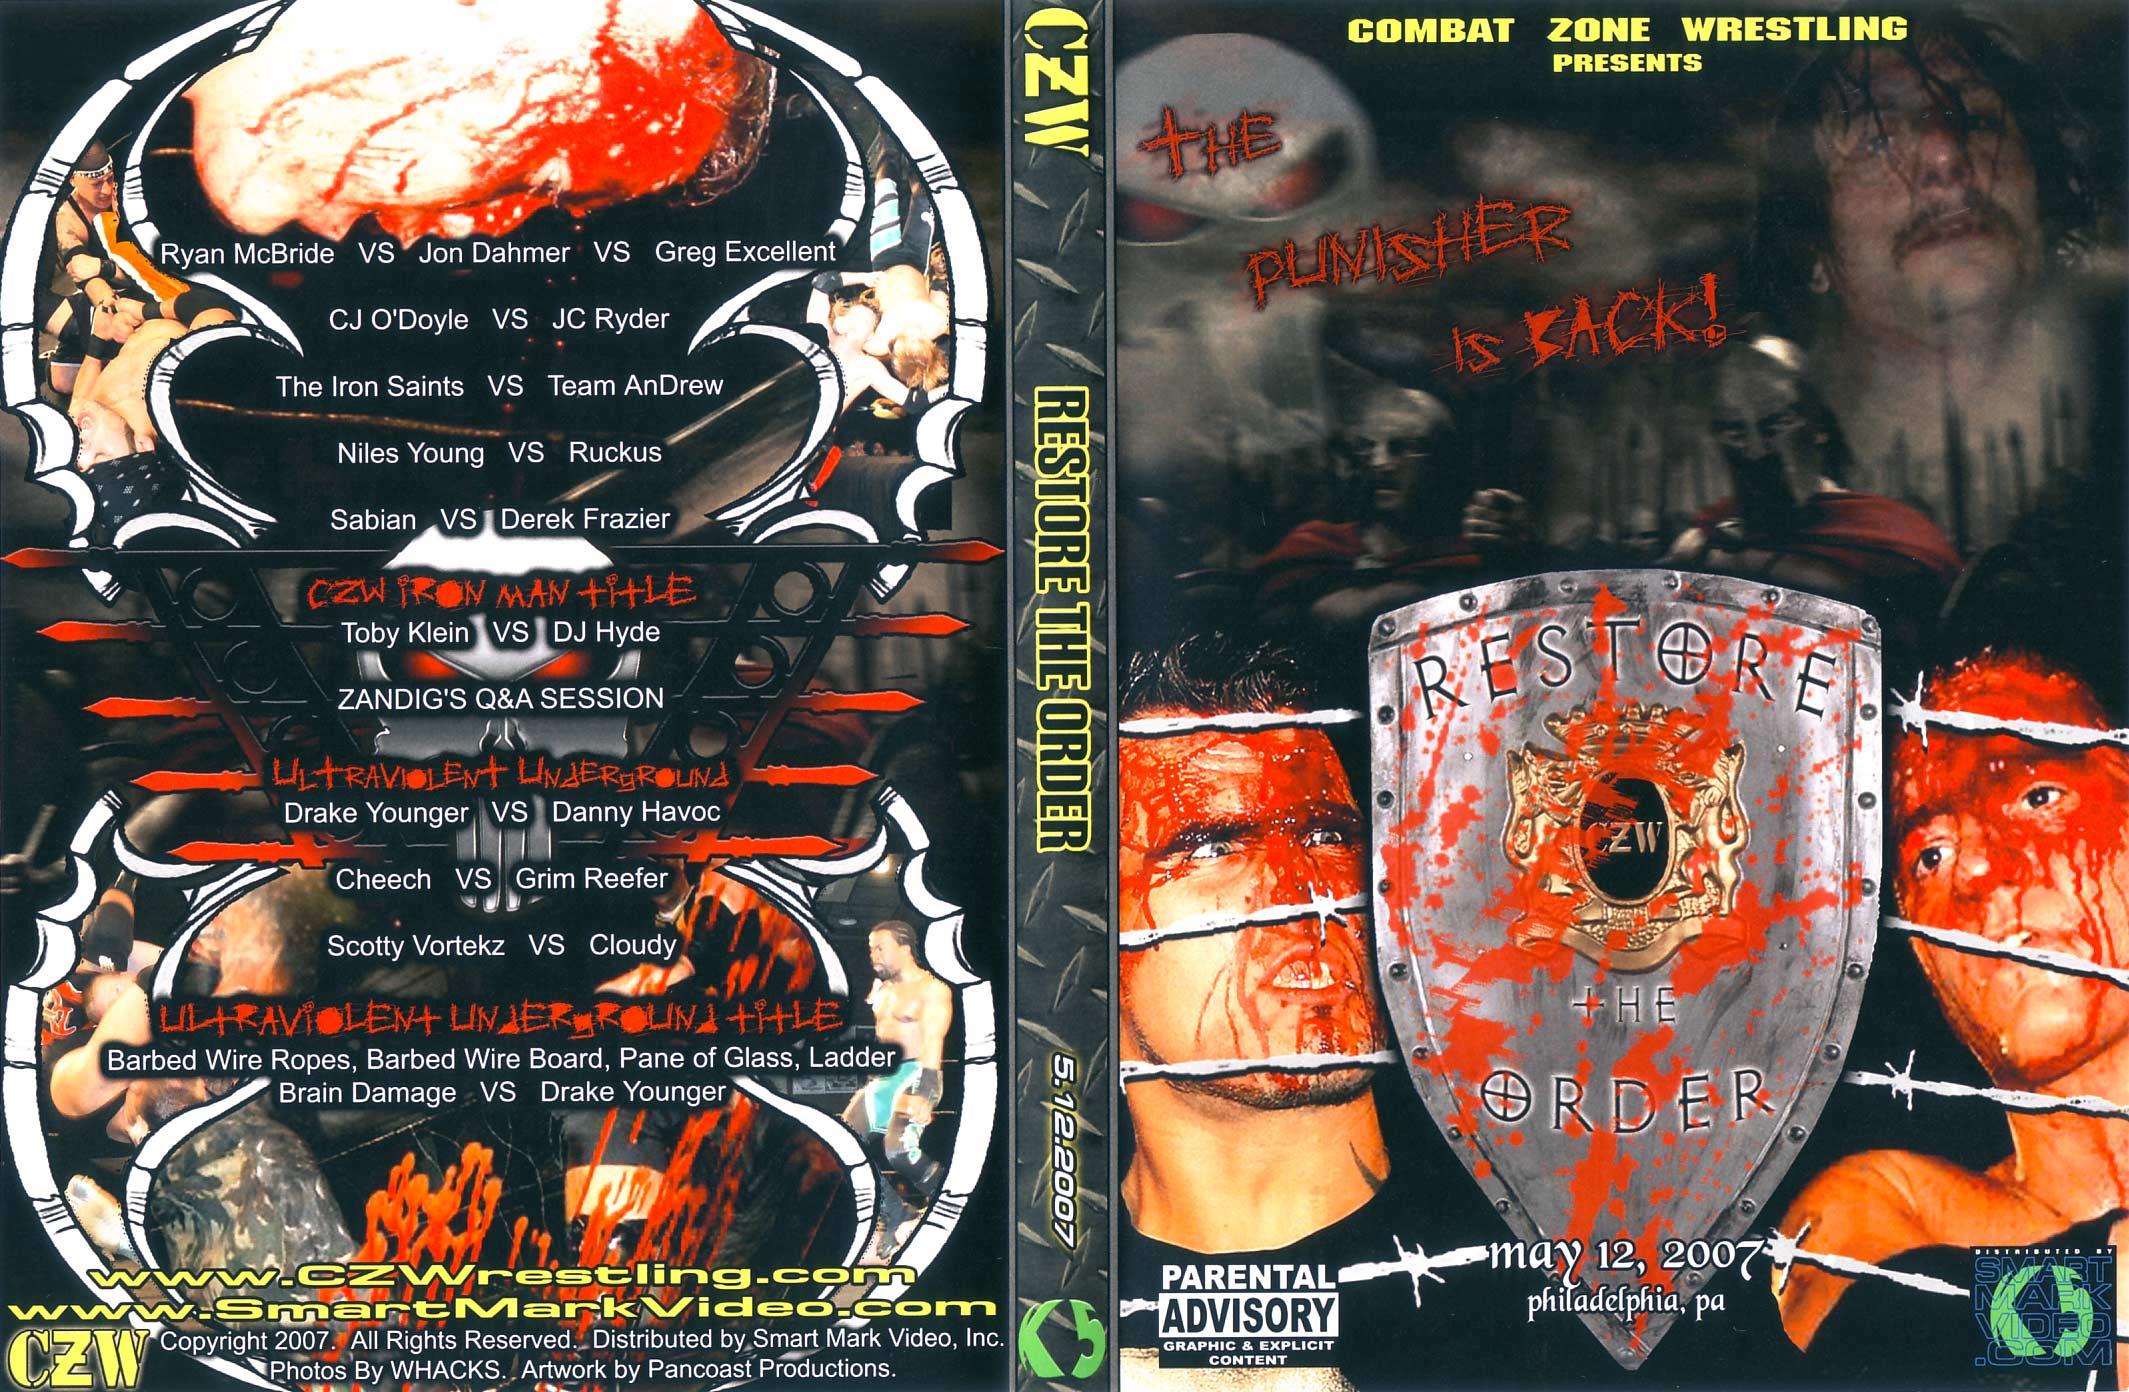 CZW_Restore_The_Order_-_Philadelphia,_PA_12052007_-_Cover